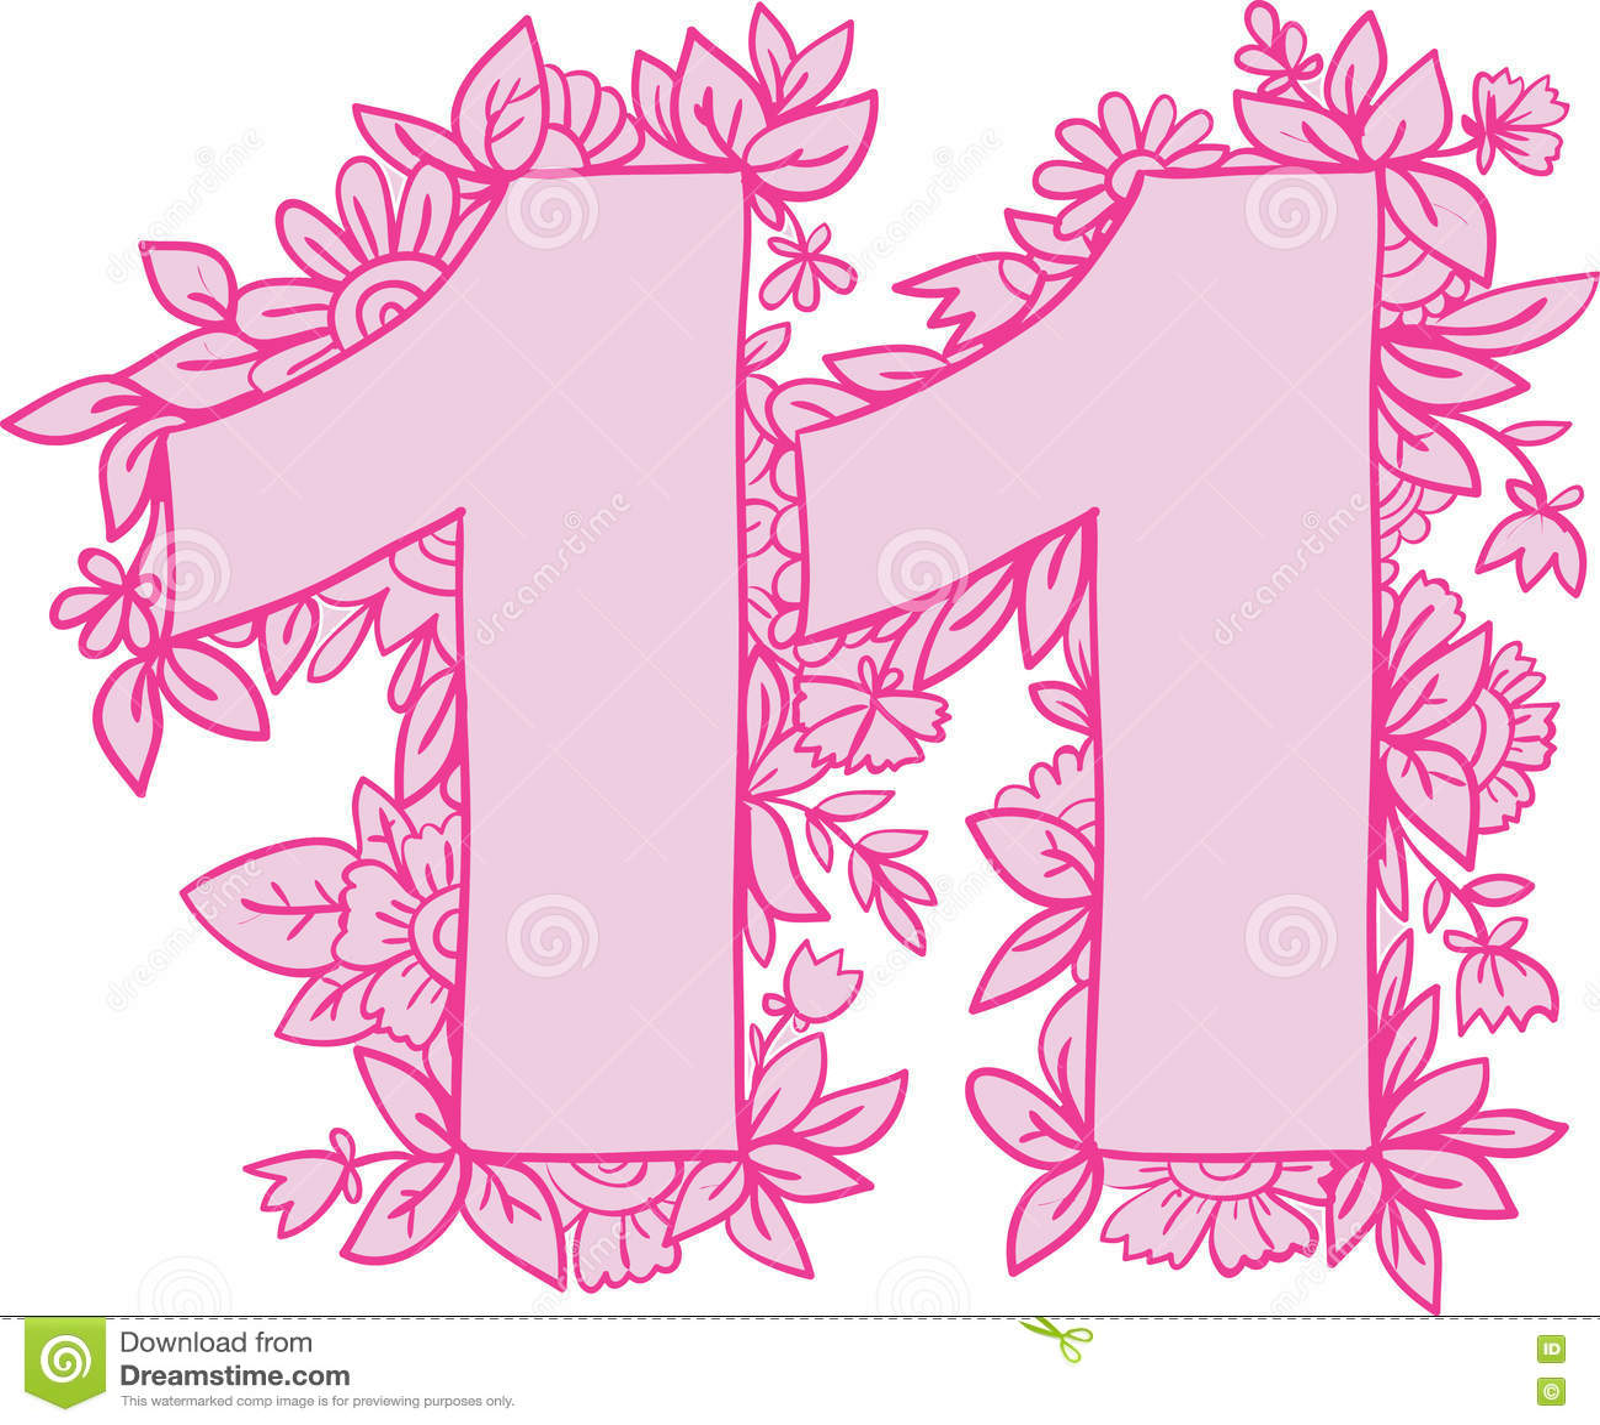 Открытки с цифрой 11